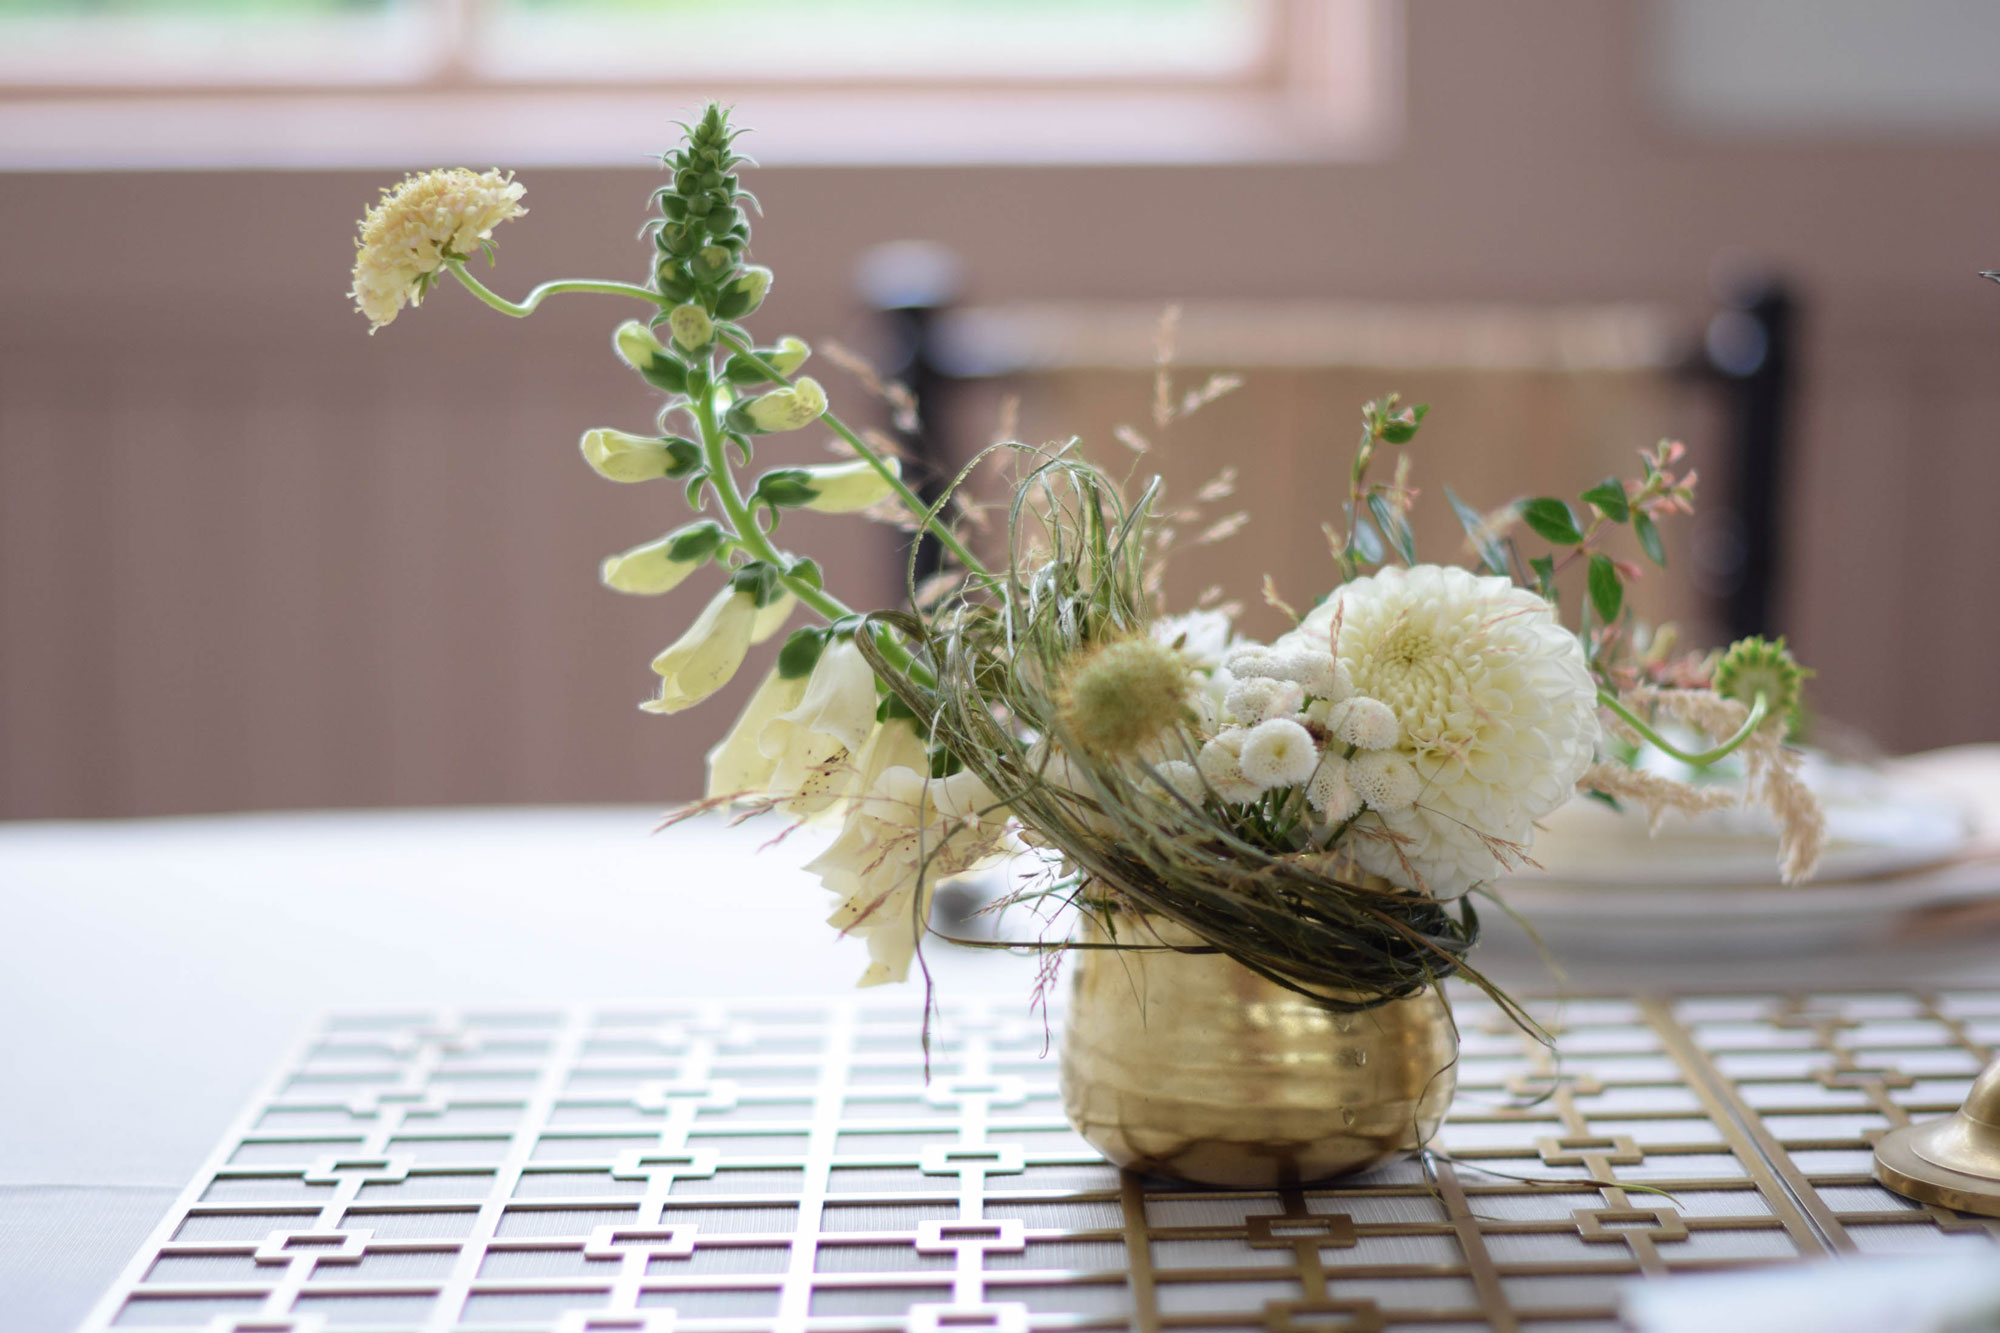 BBJ-Photoshoot--Curious-Lola--Flower-small-(4)